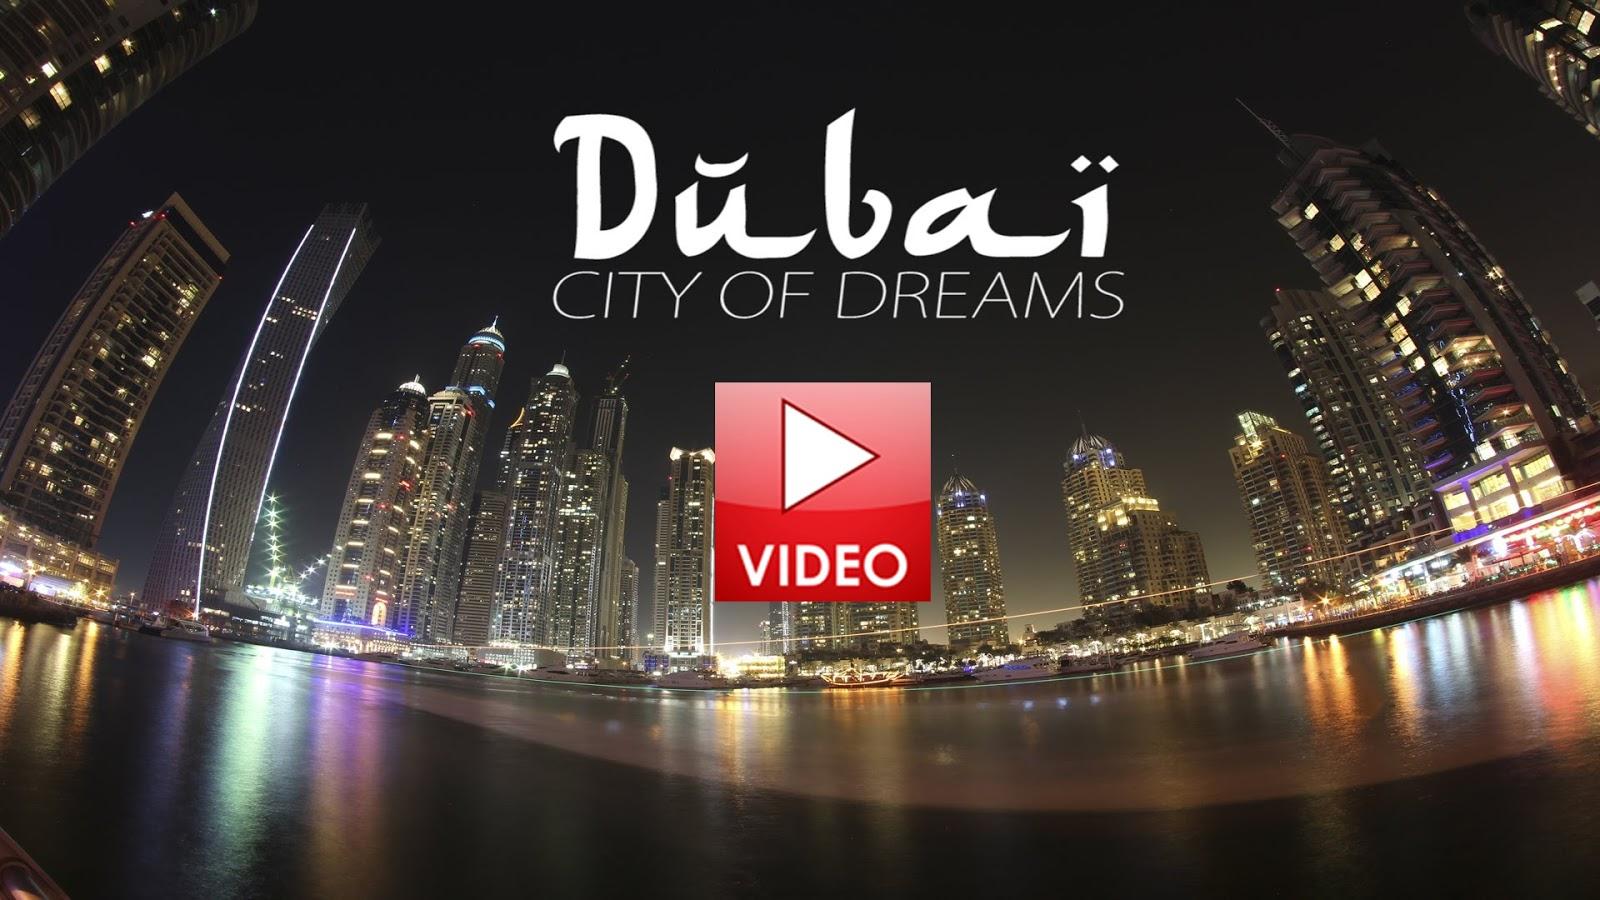 Dubai Documentary Paper